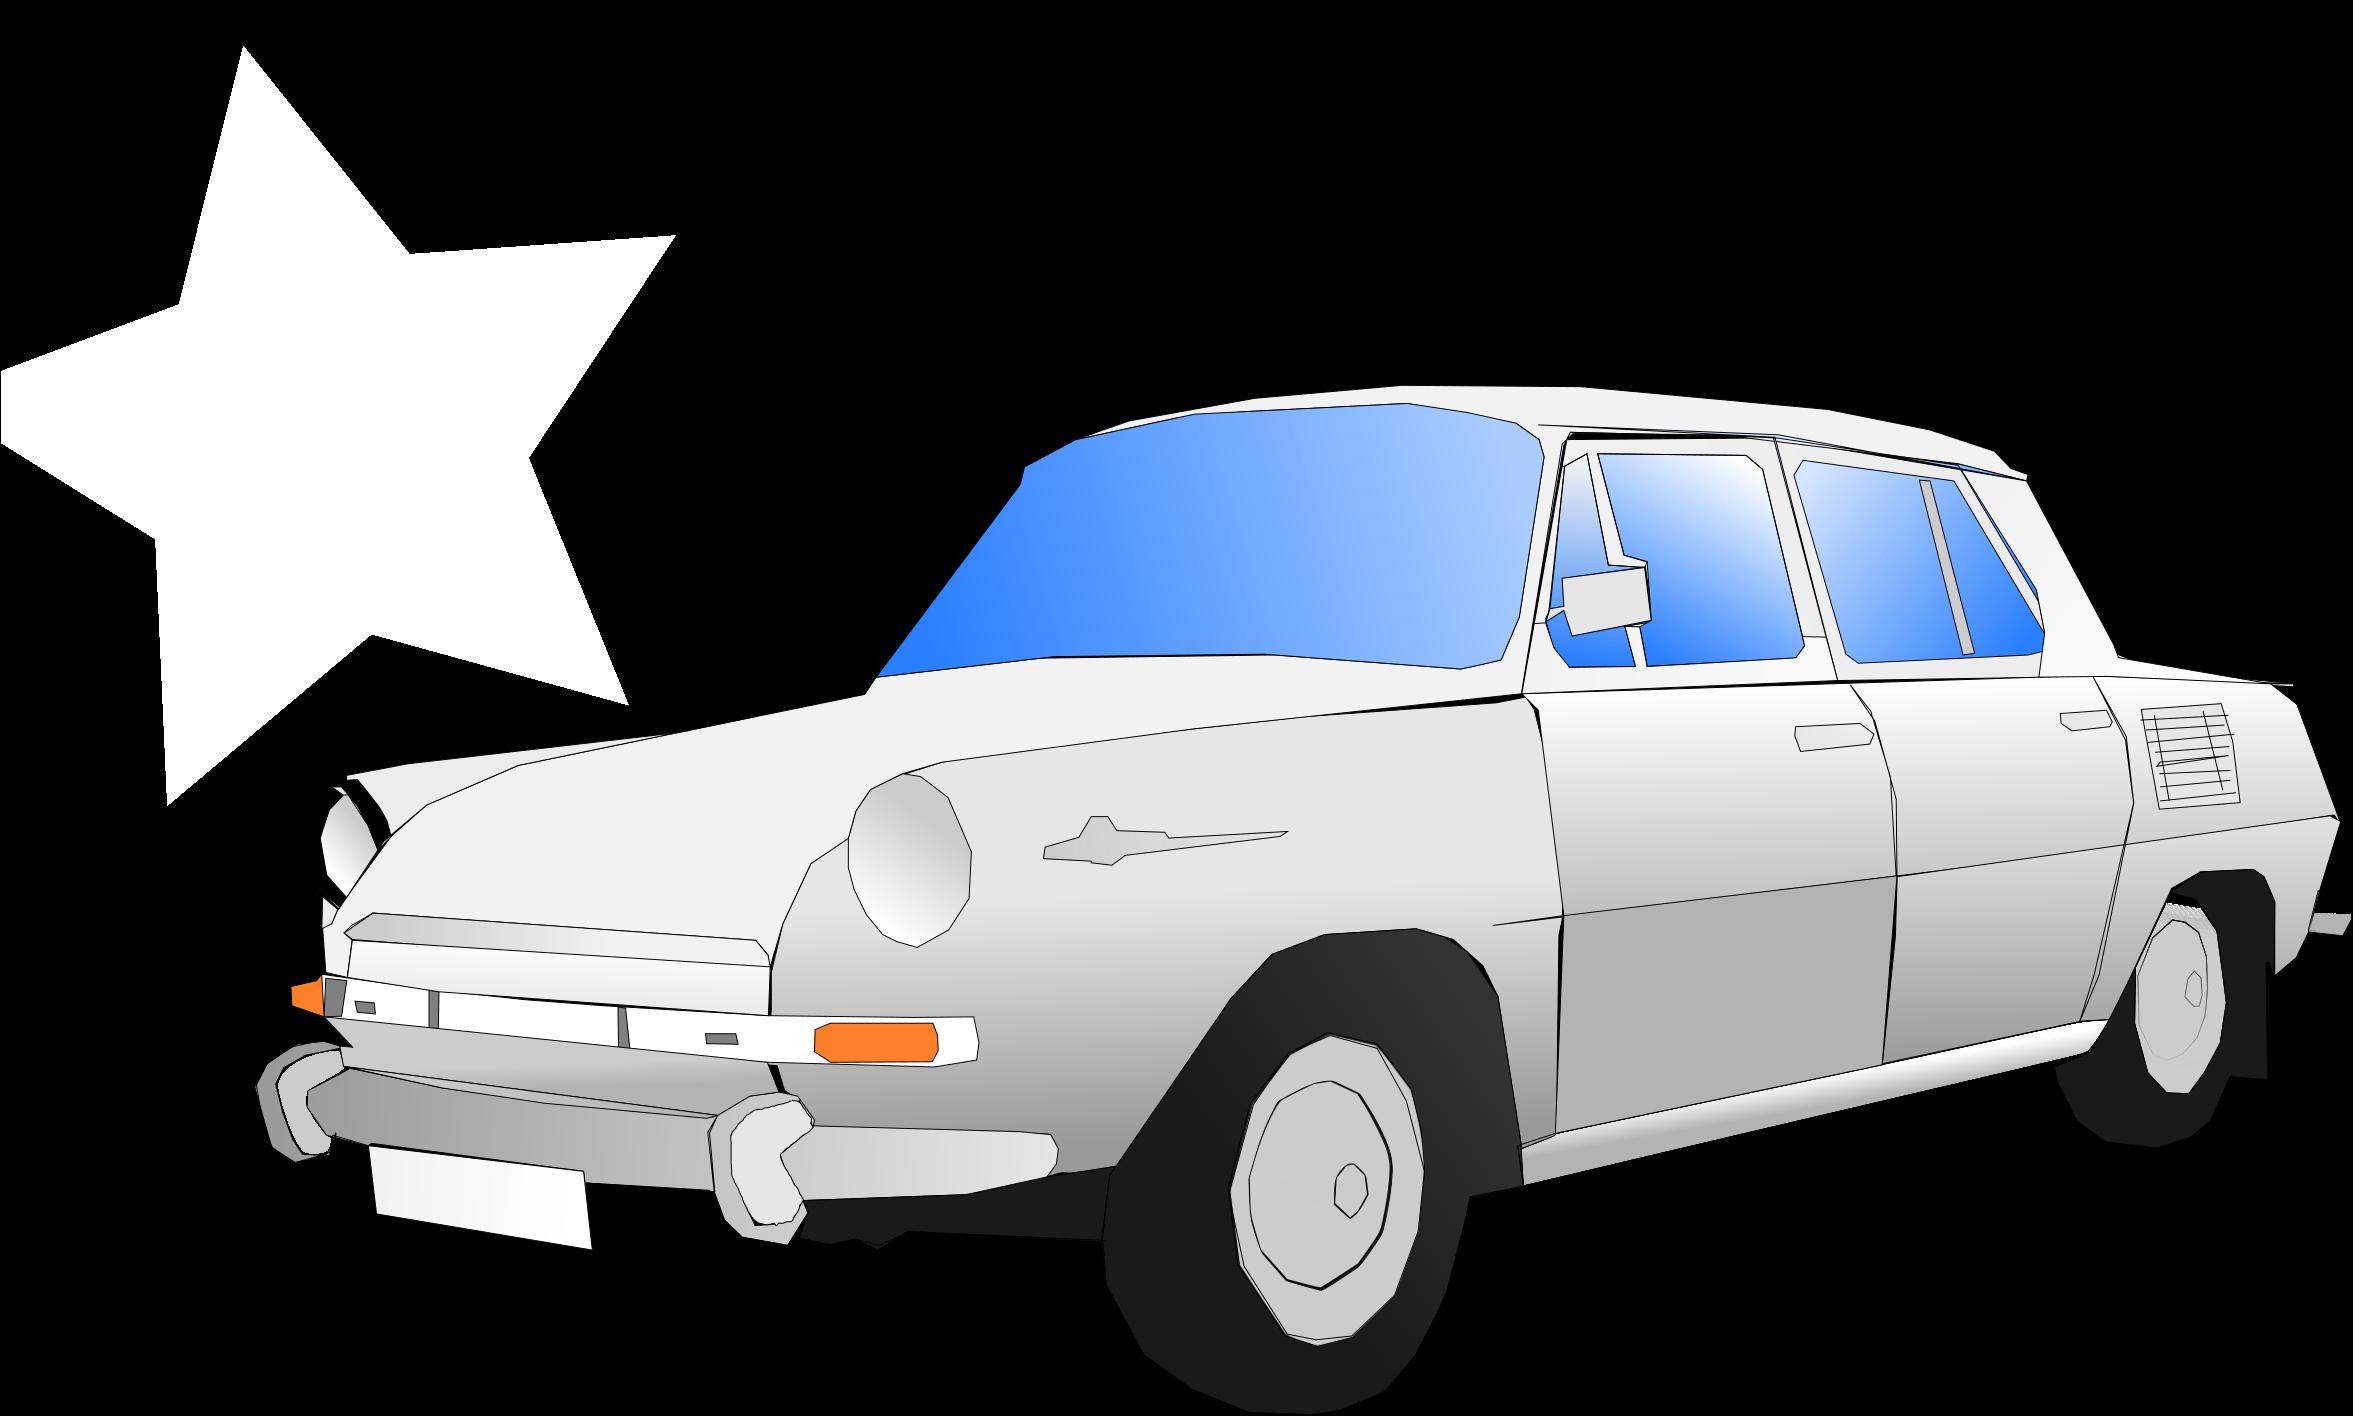 Big Image - Škoda 1000 Mb Png (2400x1557), Png Download